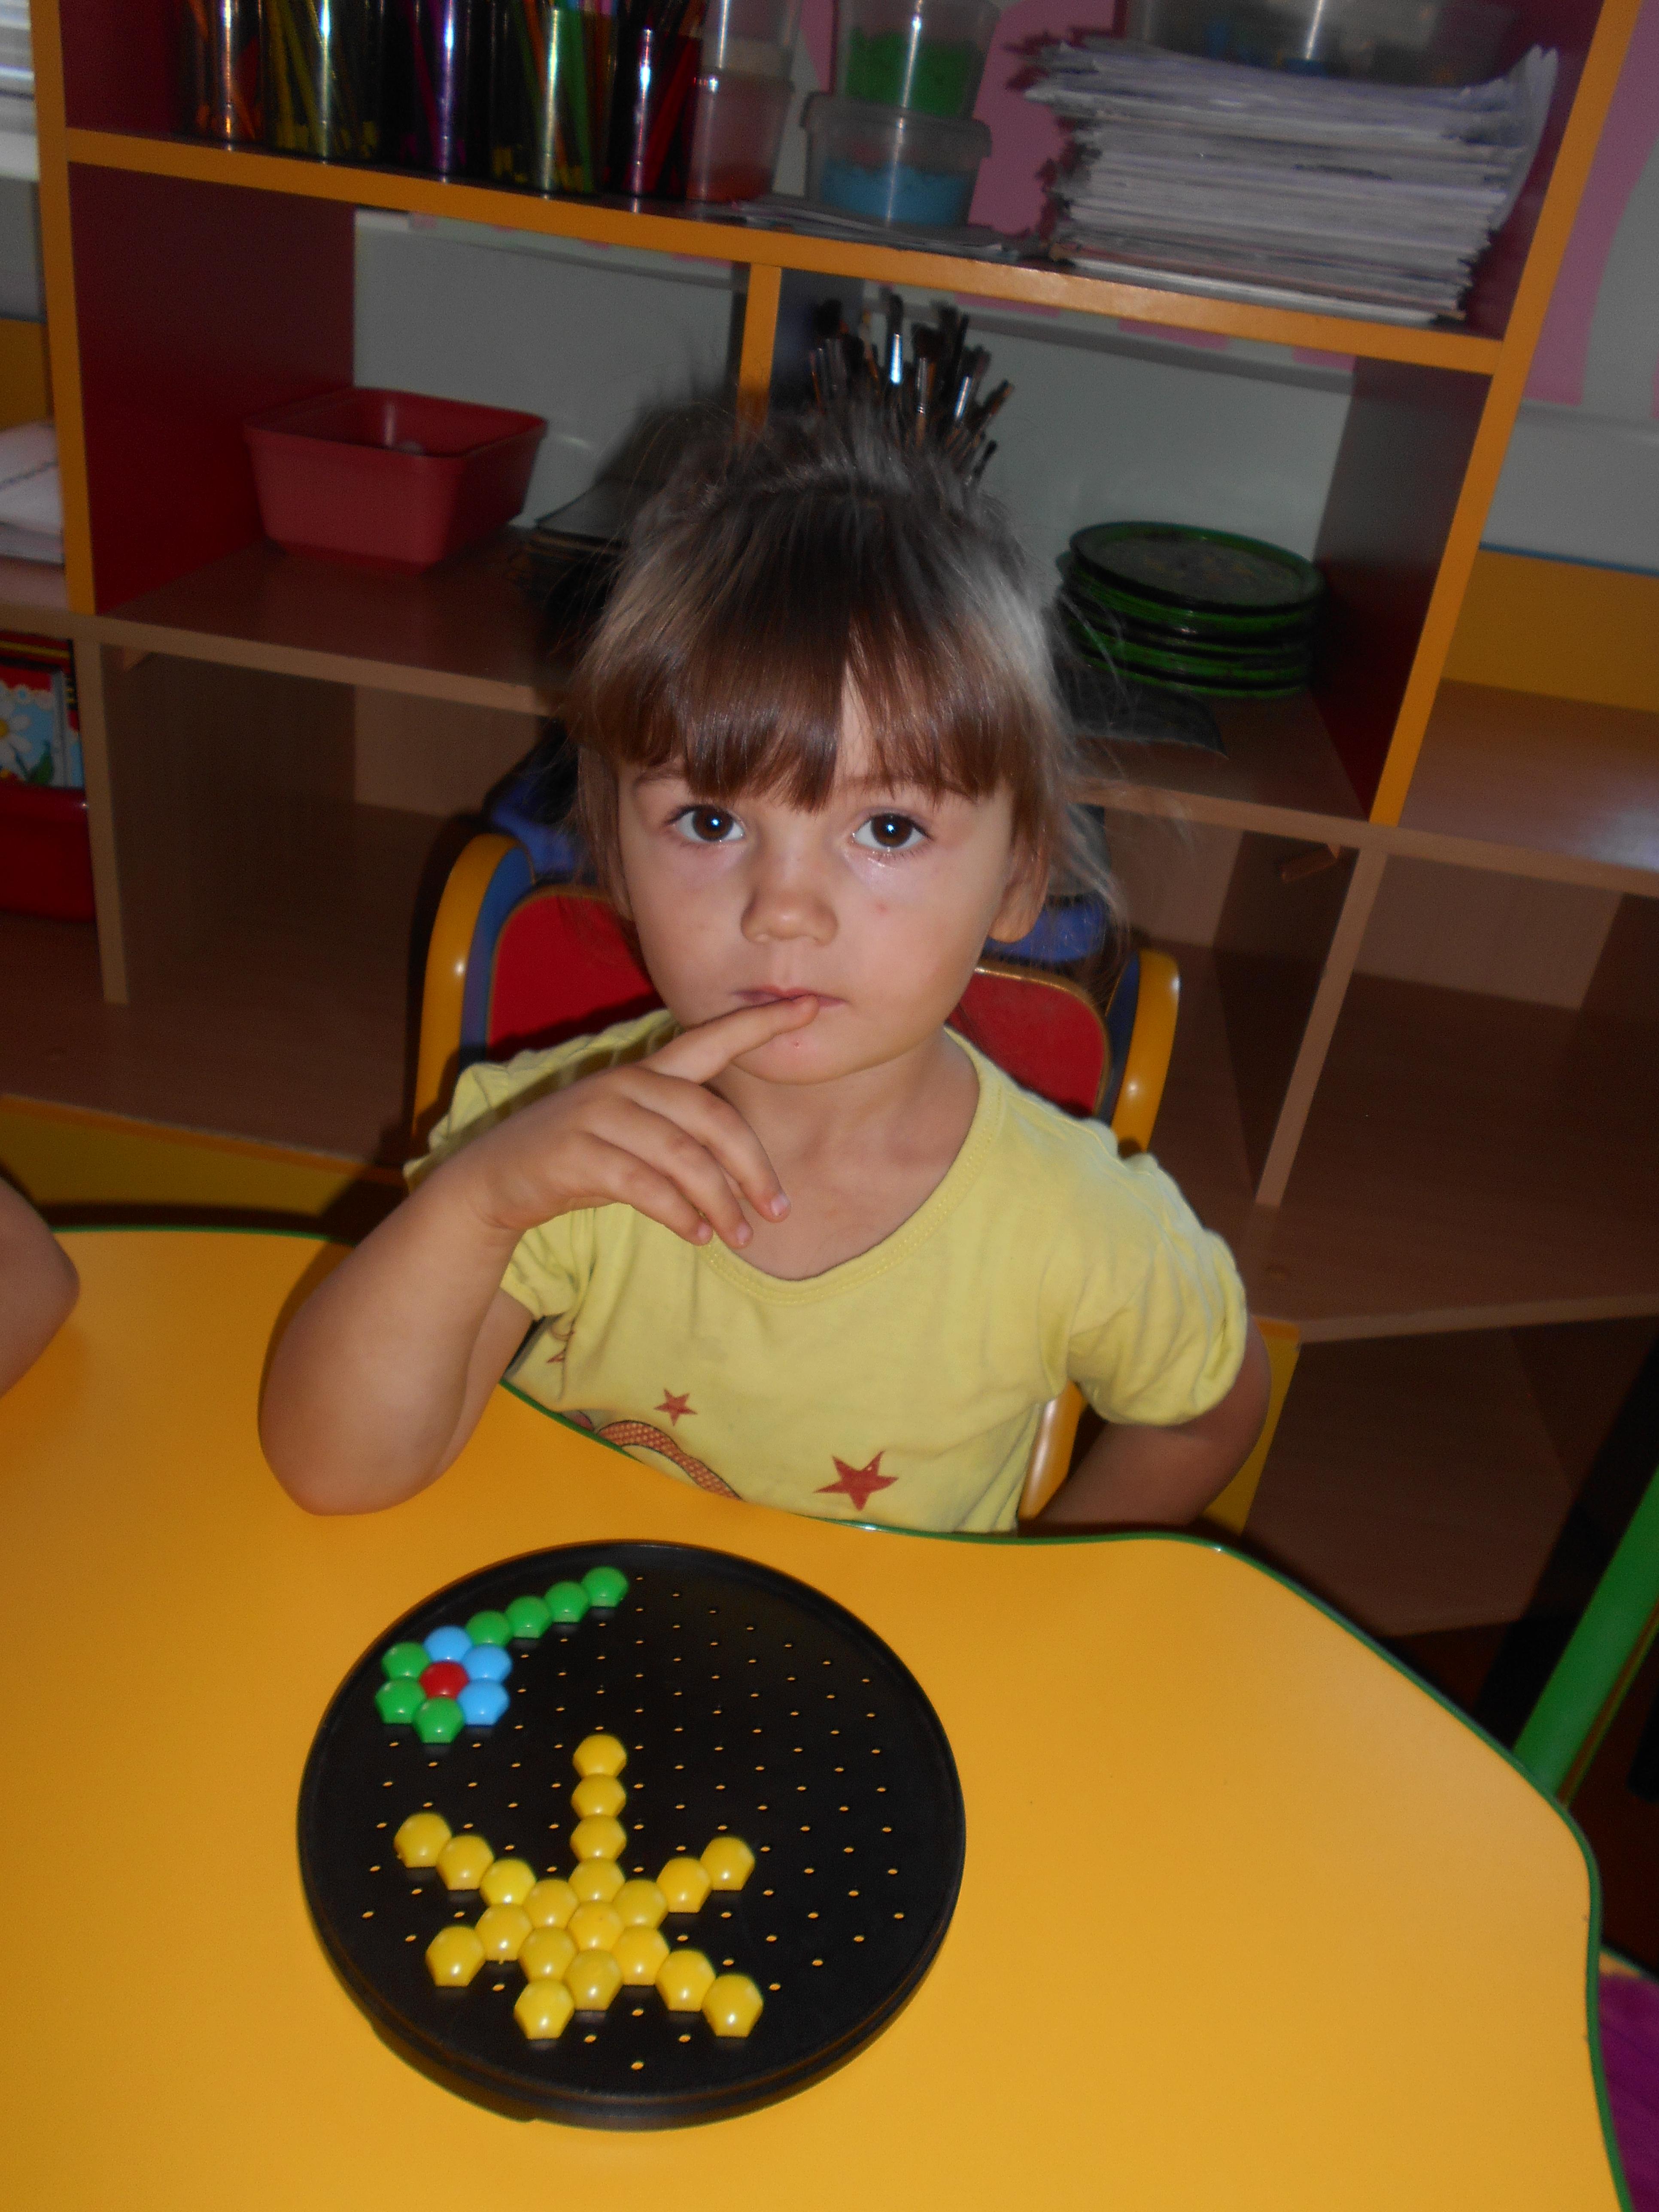 Развитие у ребенка мелкой моторики рук фото